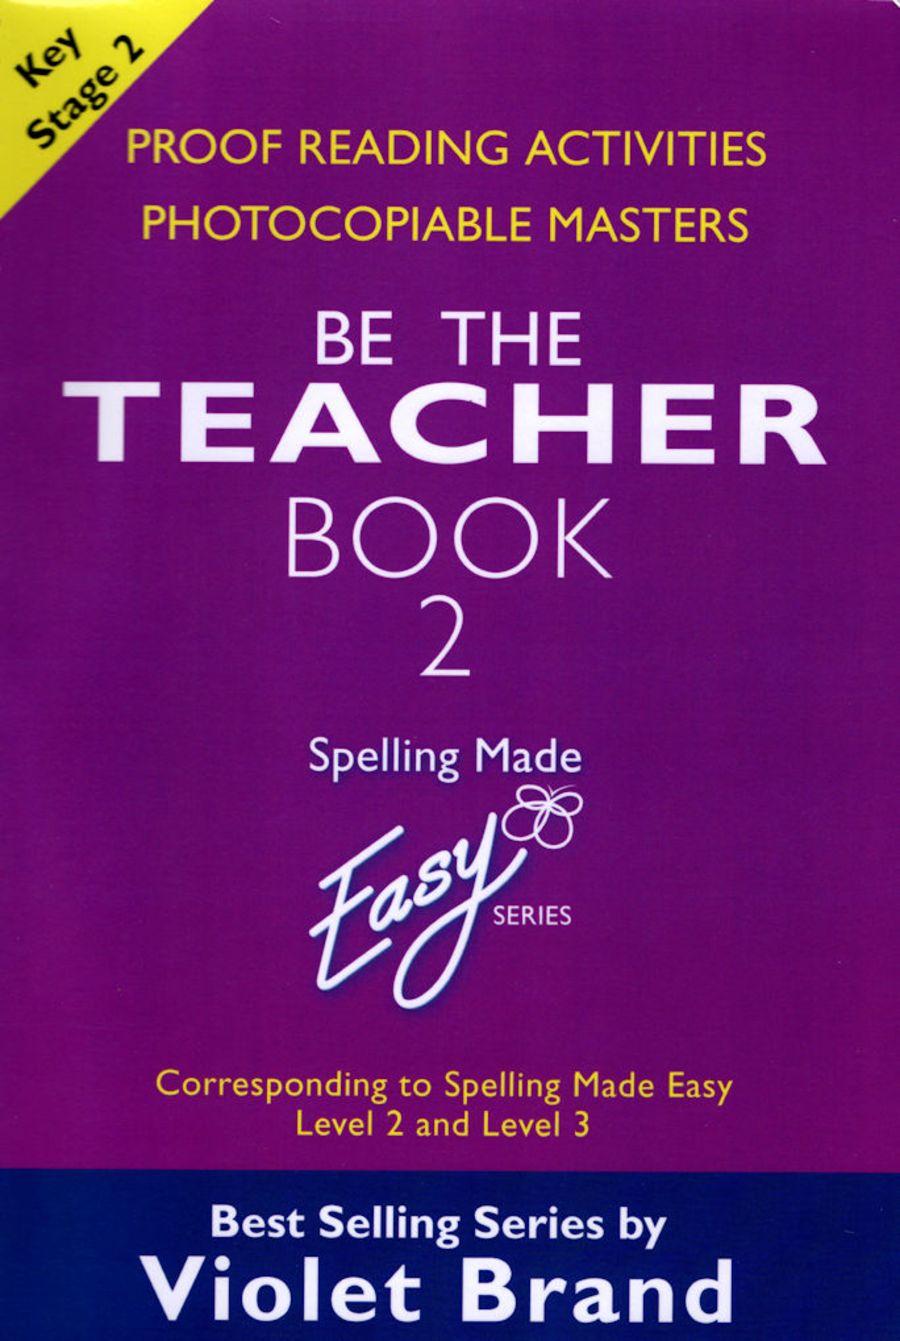 Be The Teacher - Book 2